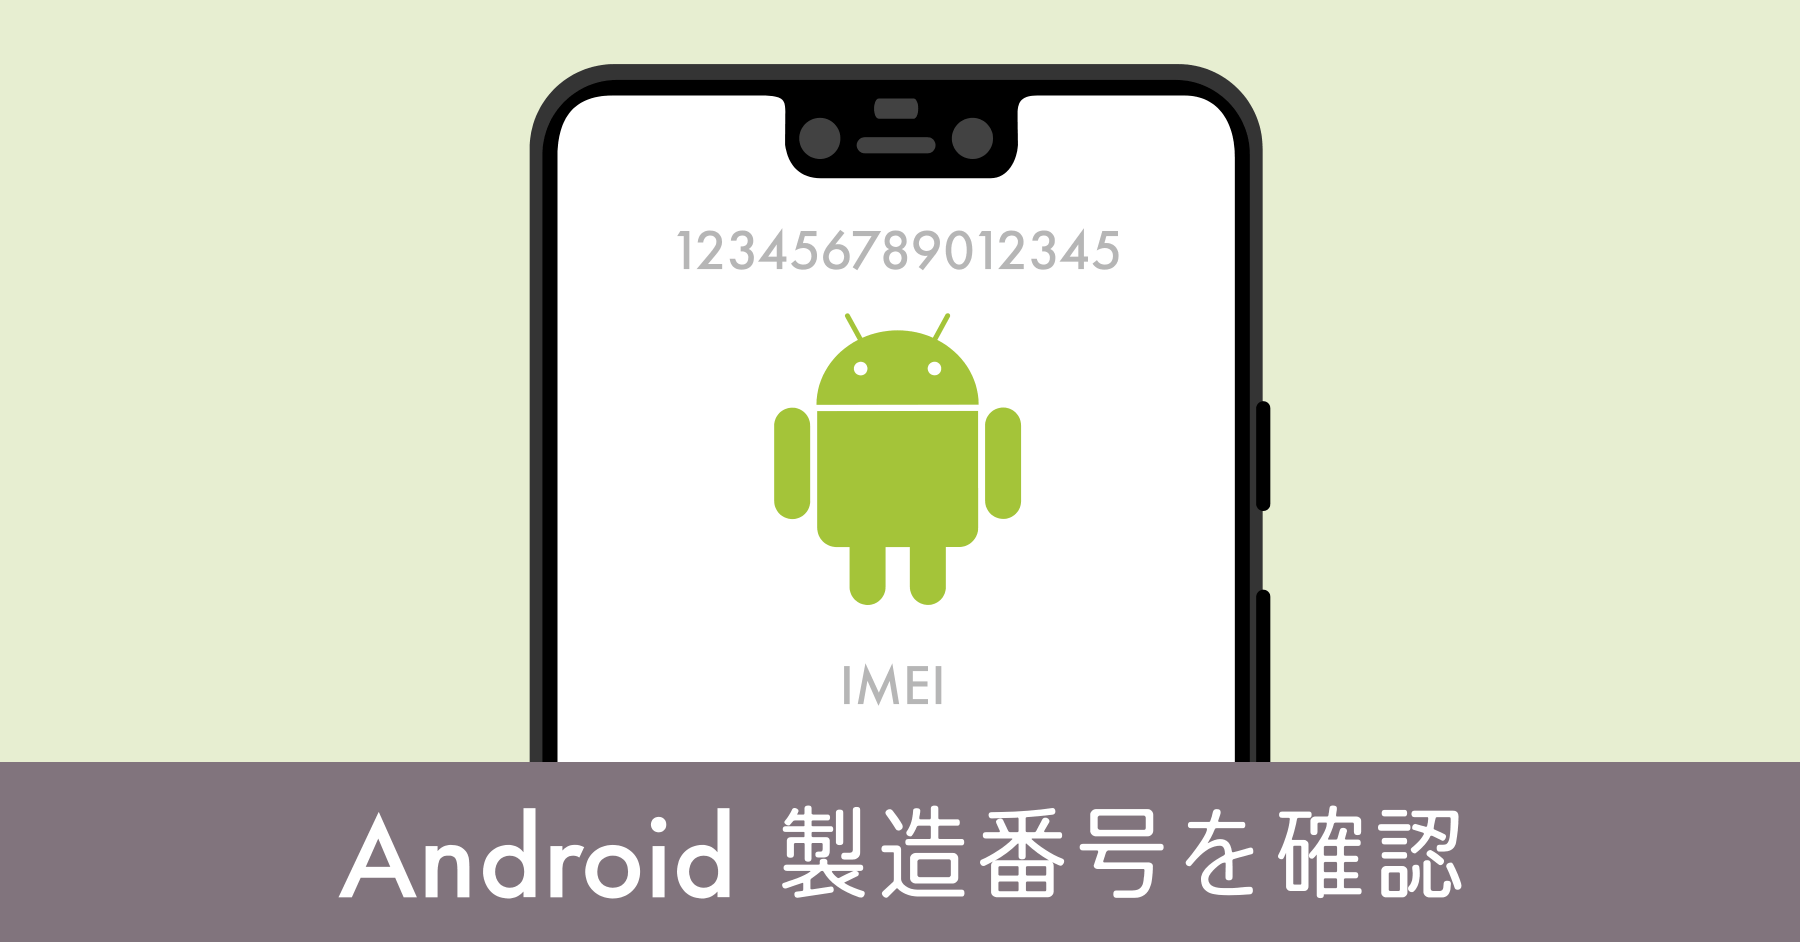 Android製造番号を確認